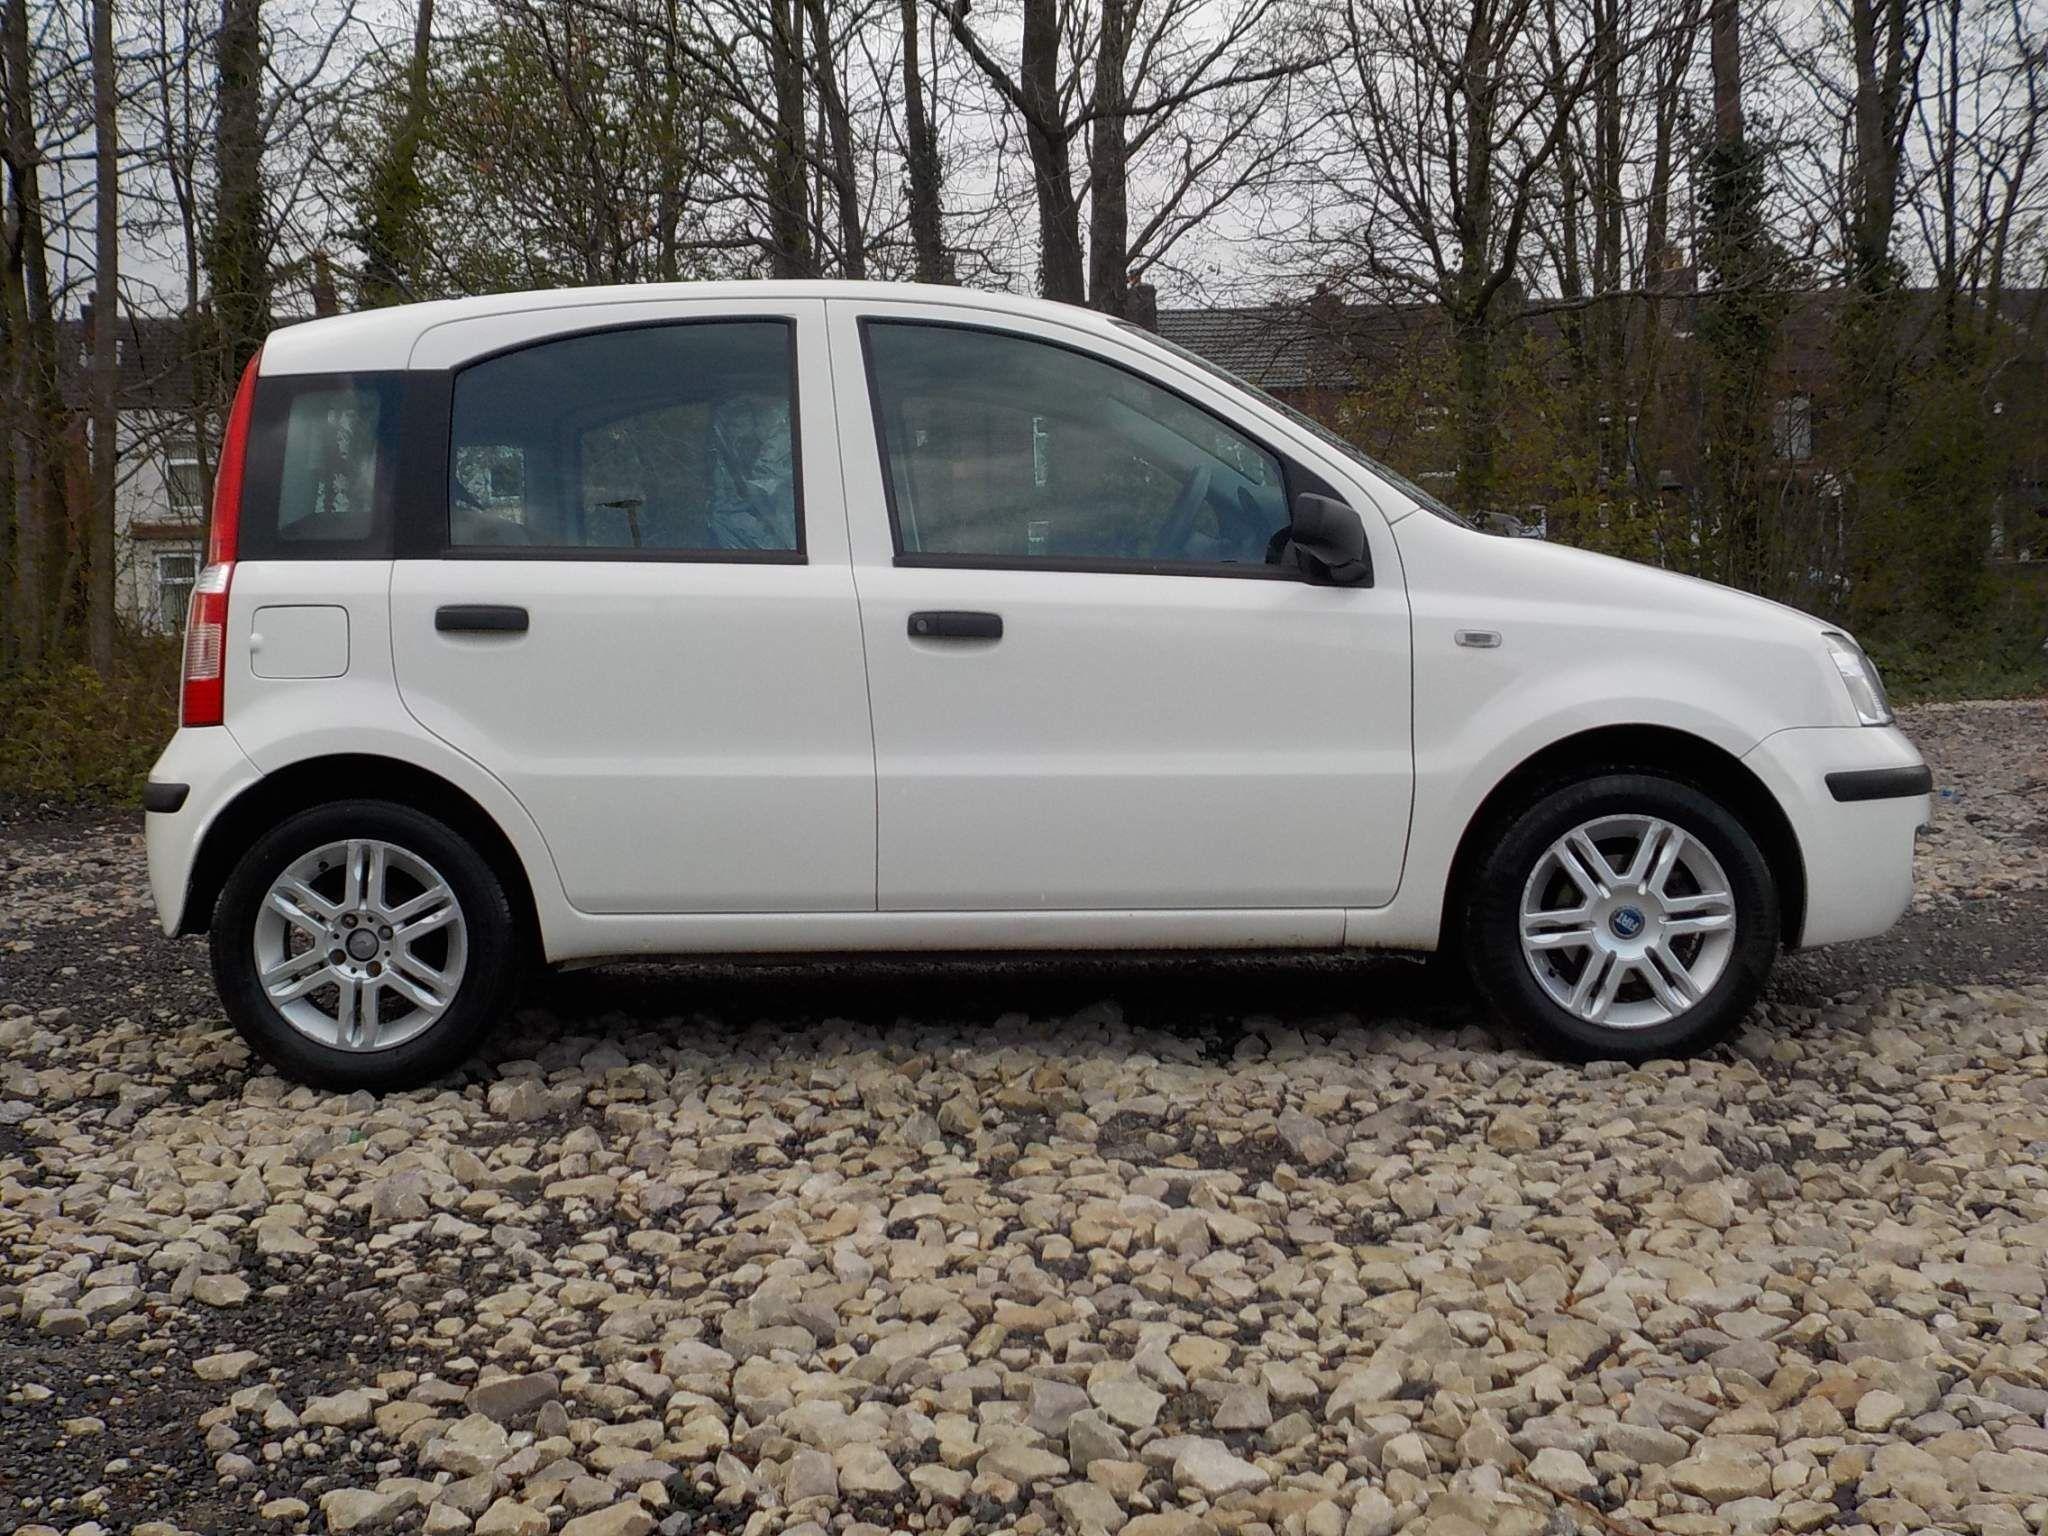 Fiat Panda 1.3 MultiJet 16v Dynamic 5dr